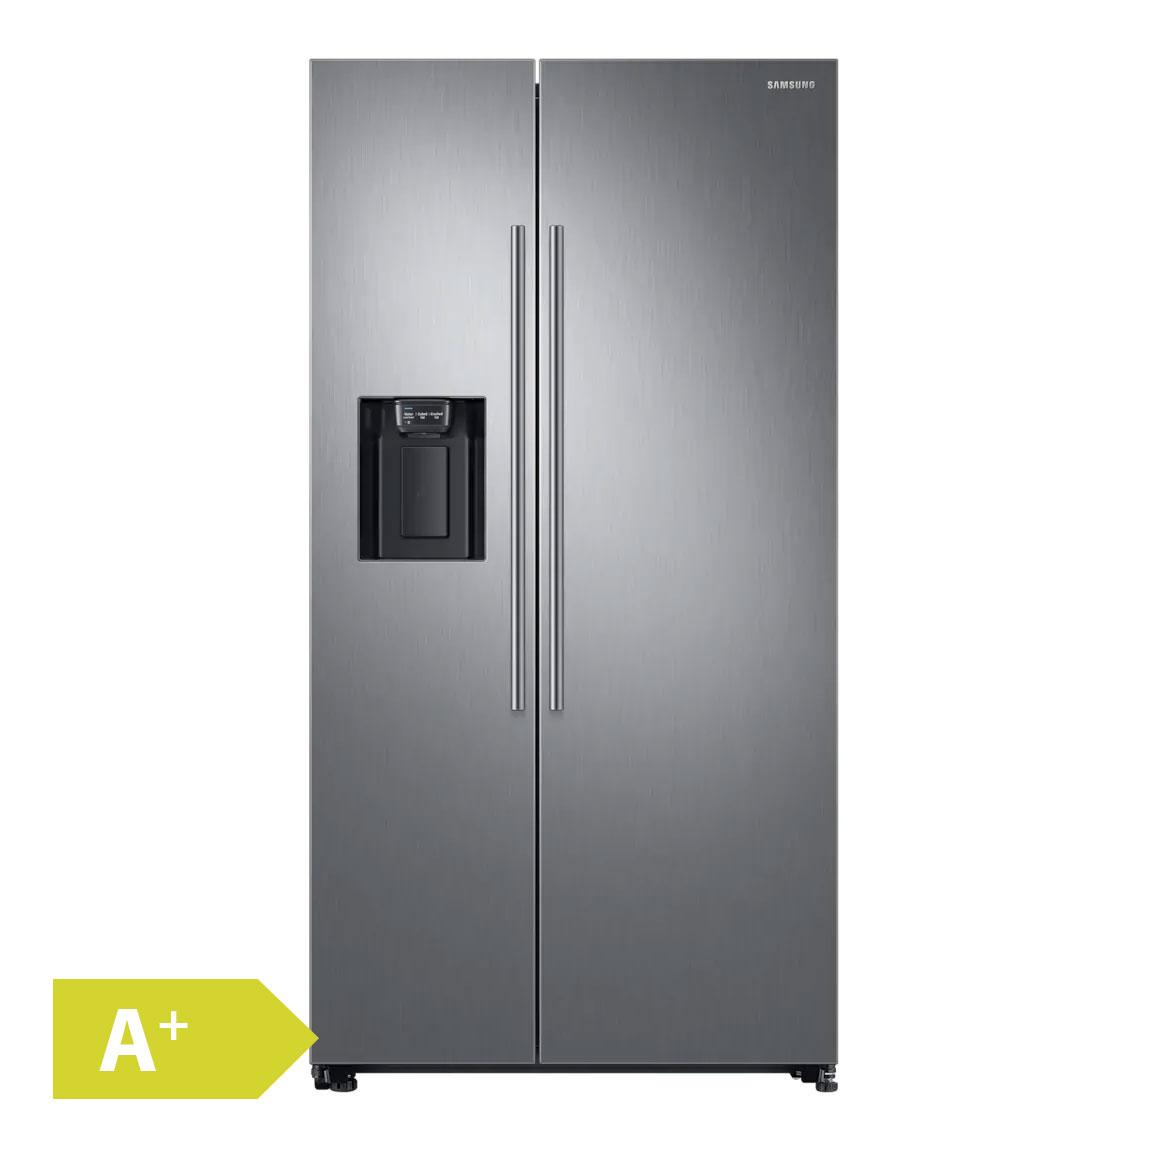 Samsung Rs6jn8210s9eg Side By Side Kühlschrank A Deltateccde